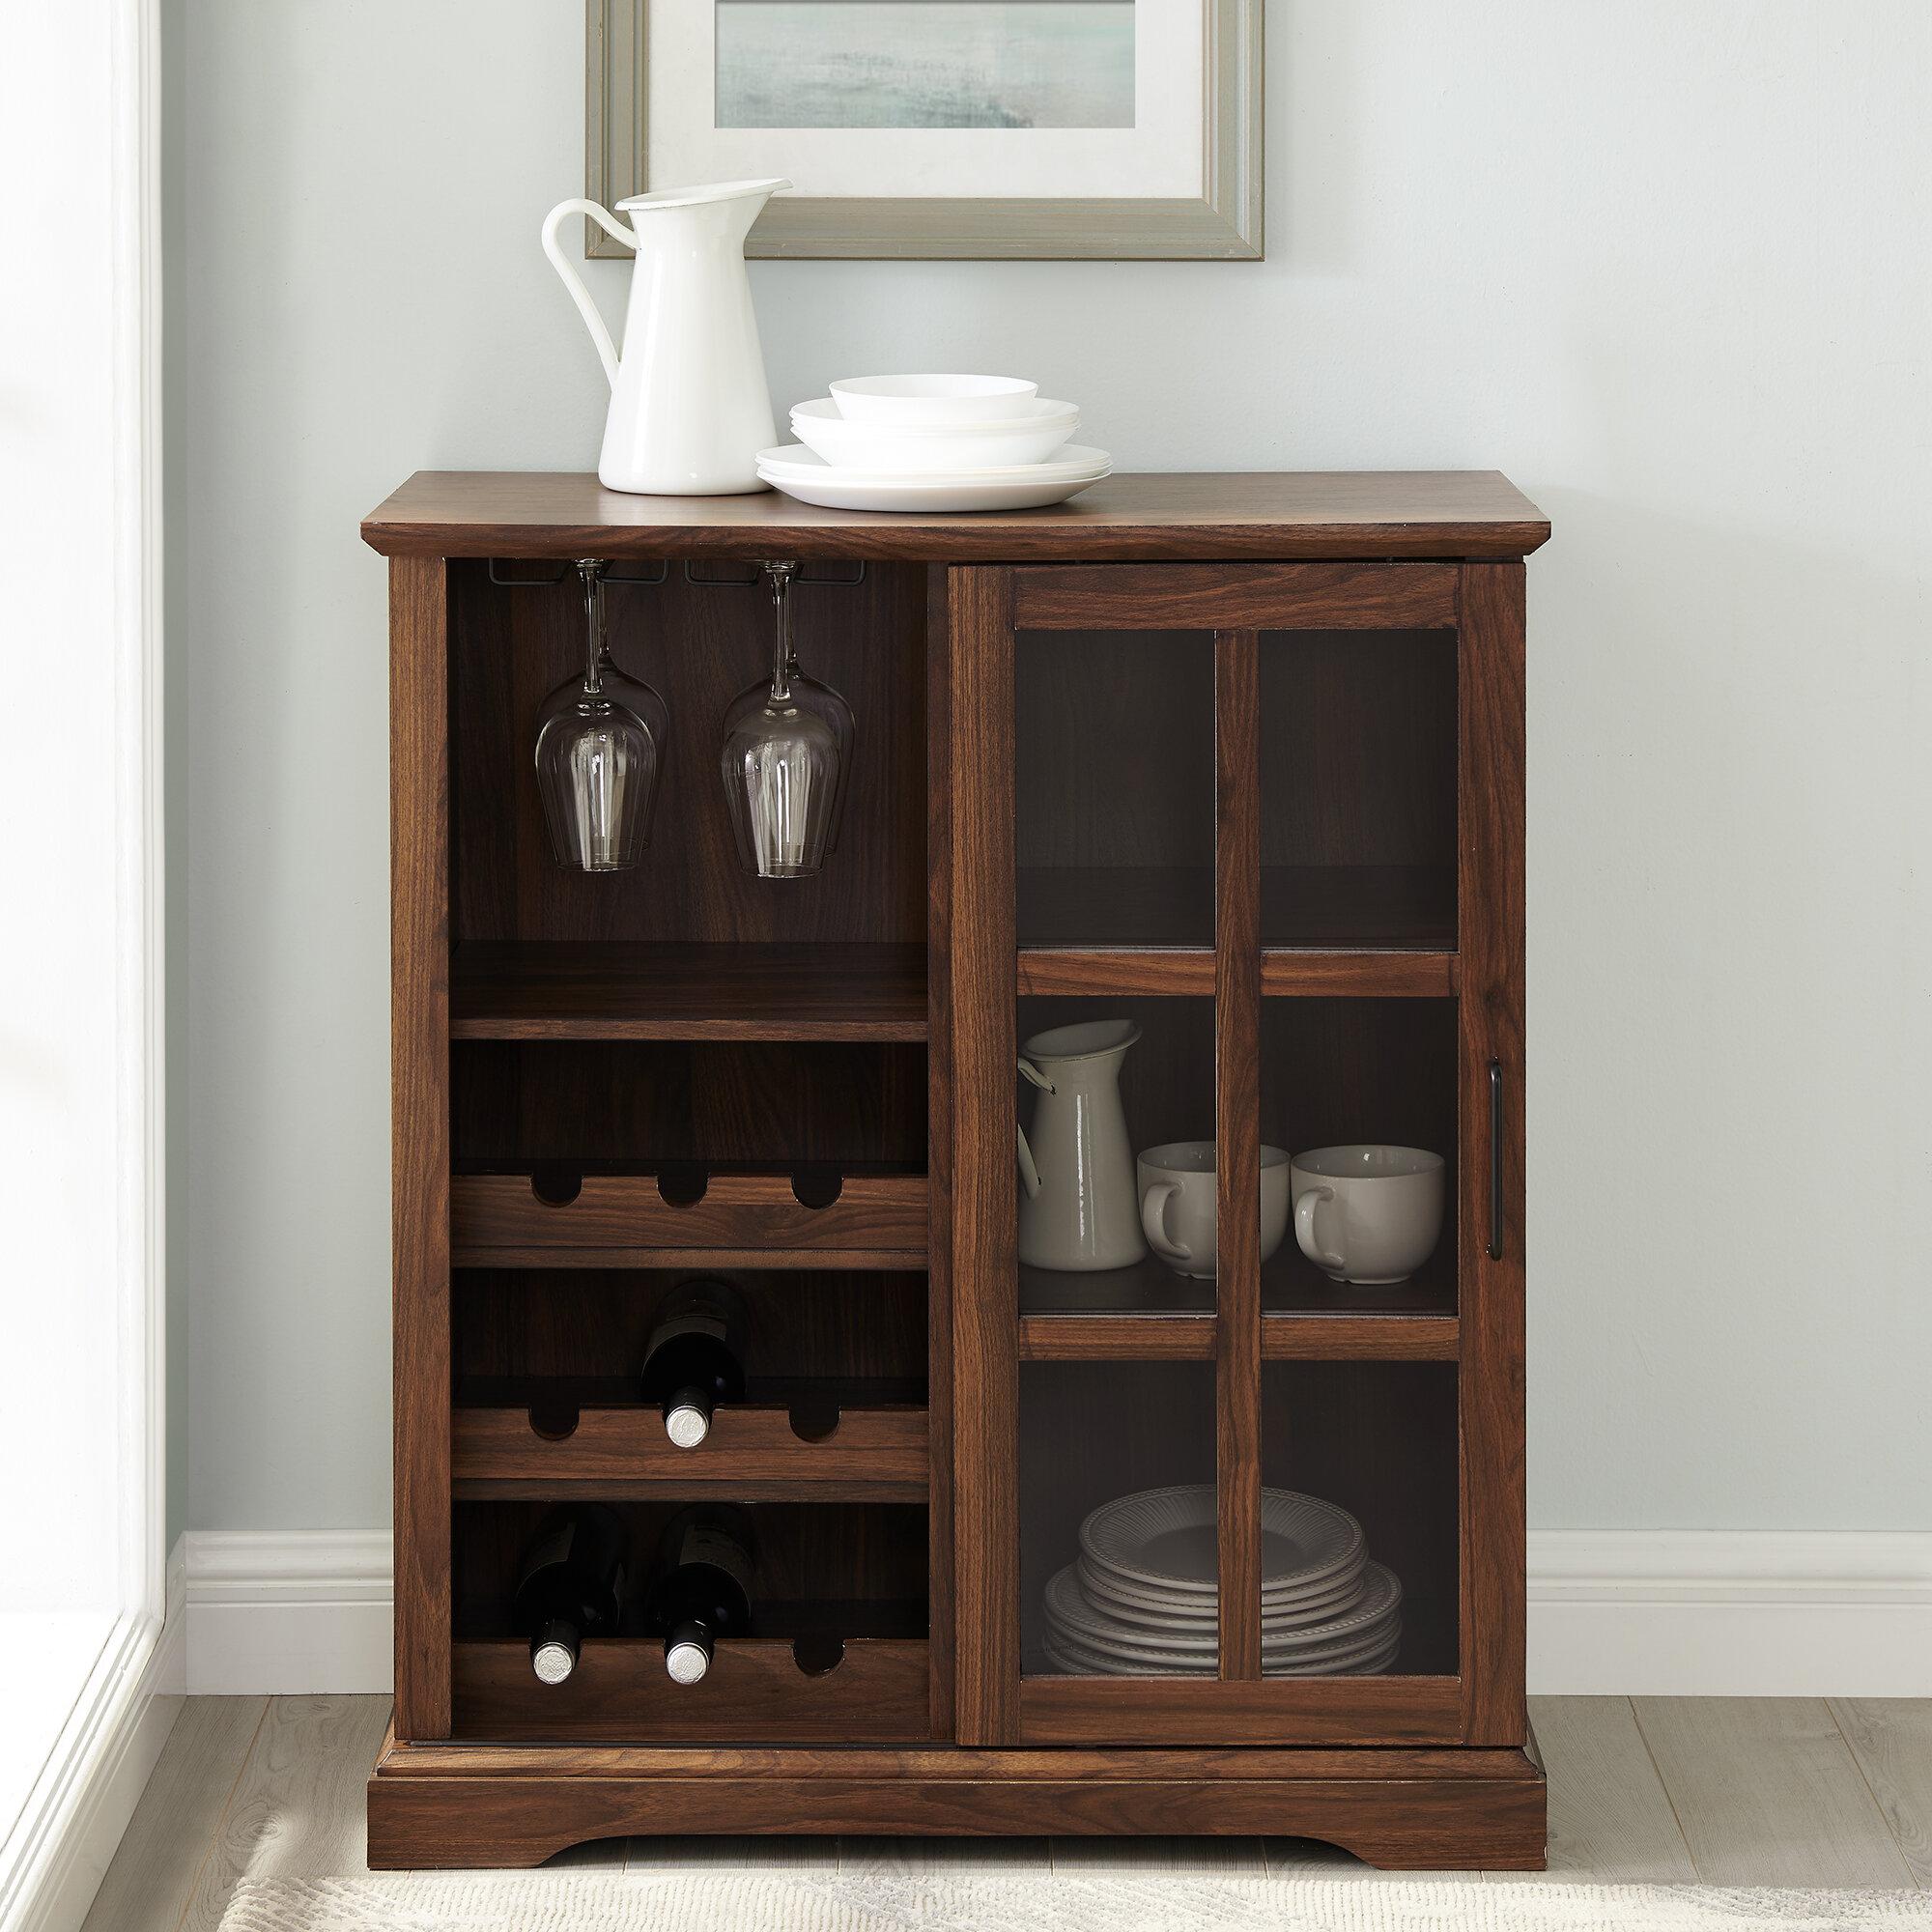 Hartwick Sliding Glass Door Bar With Wine Storage